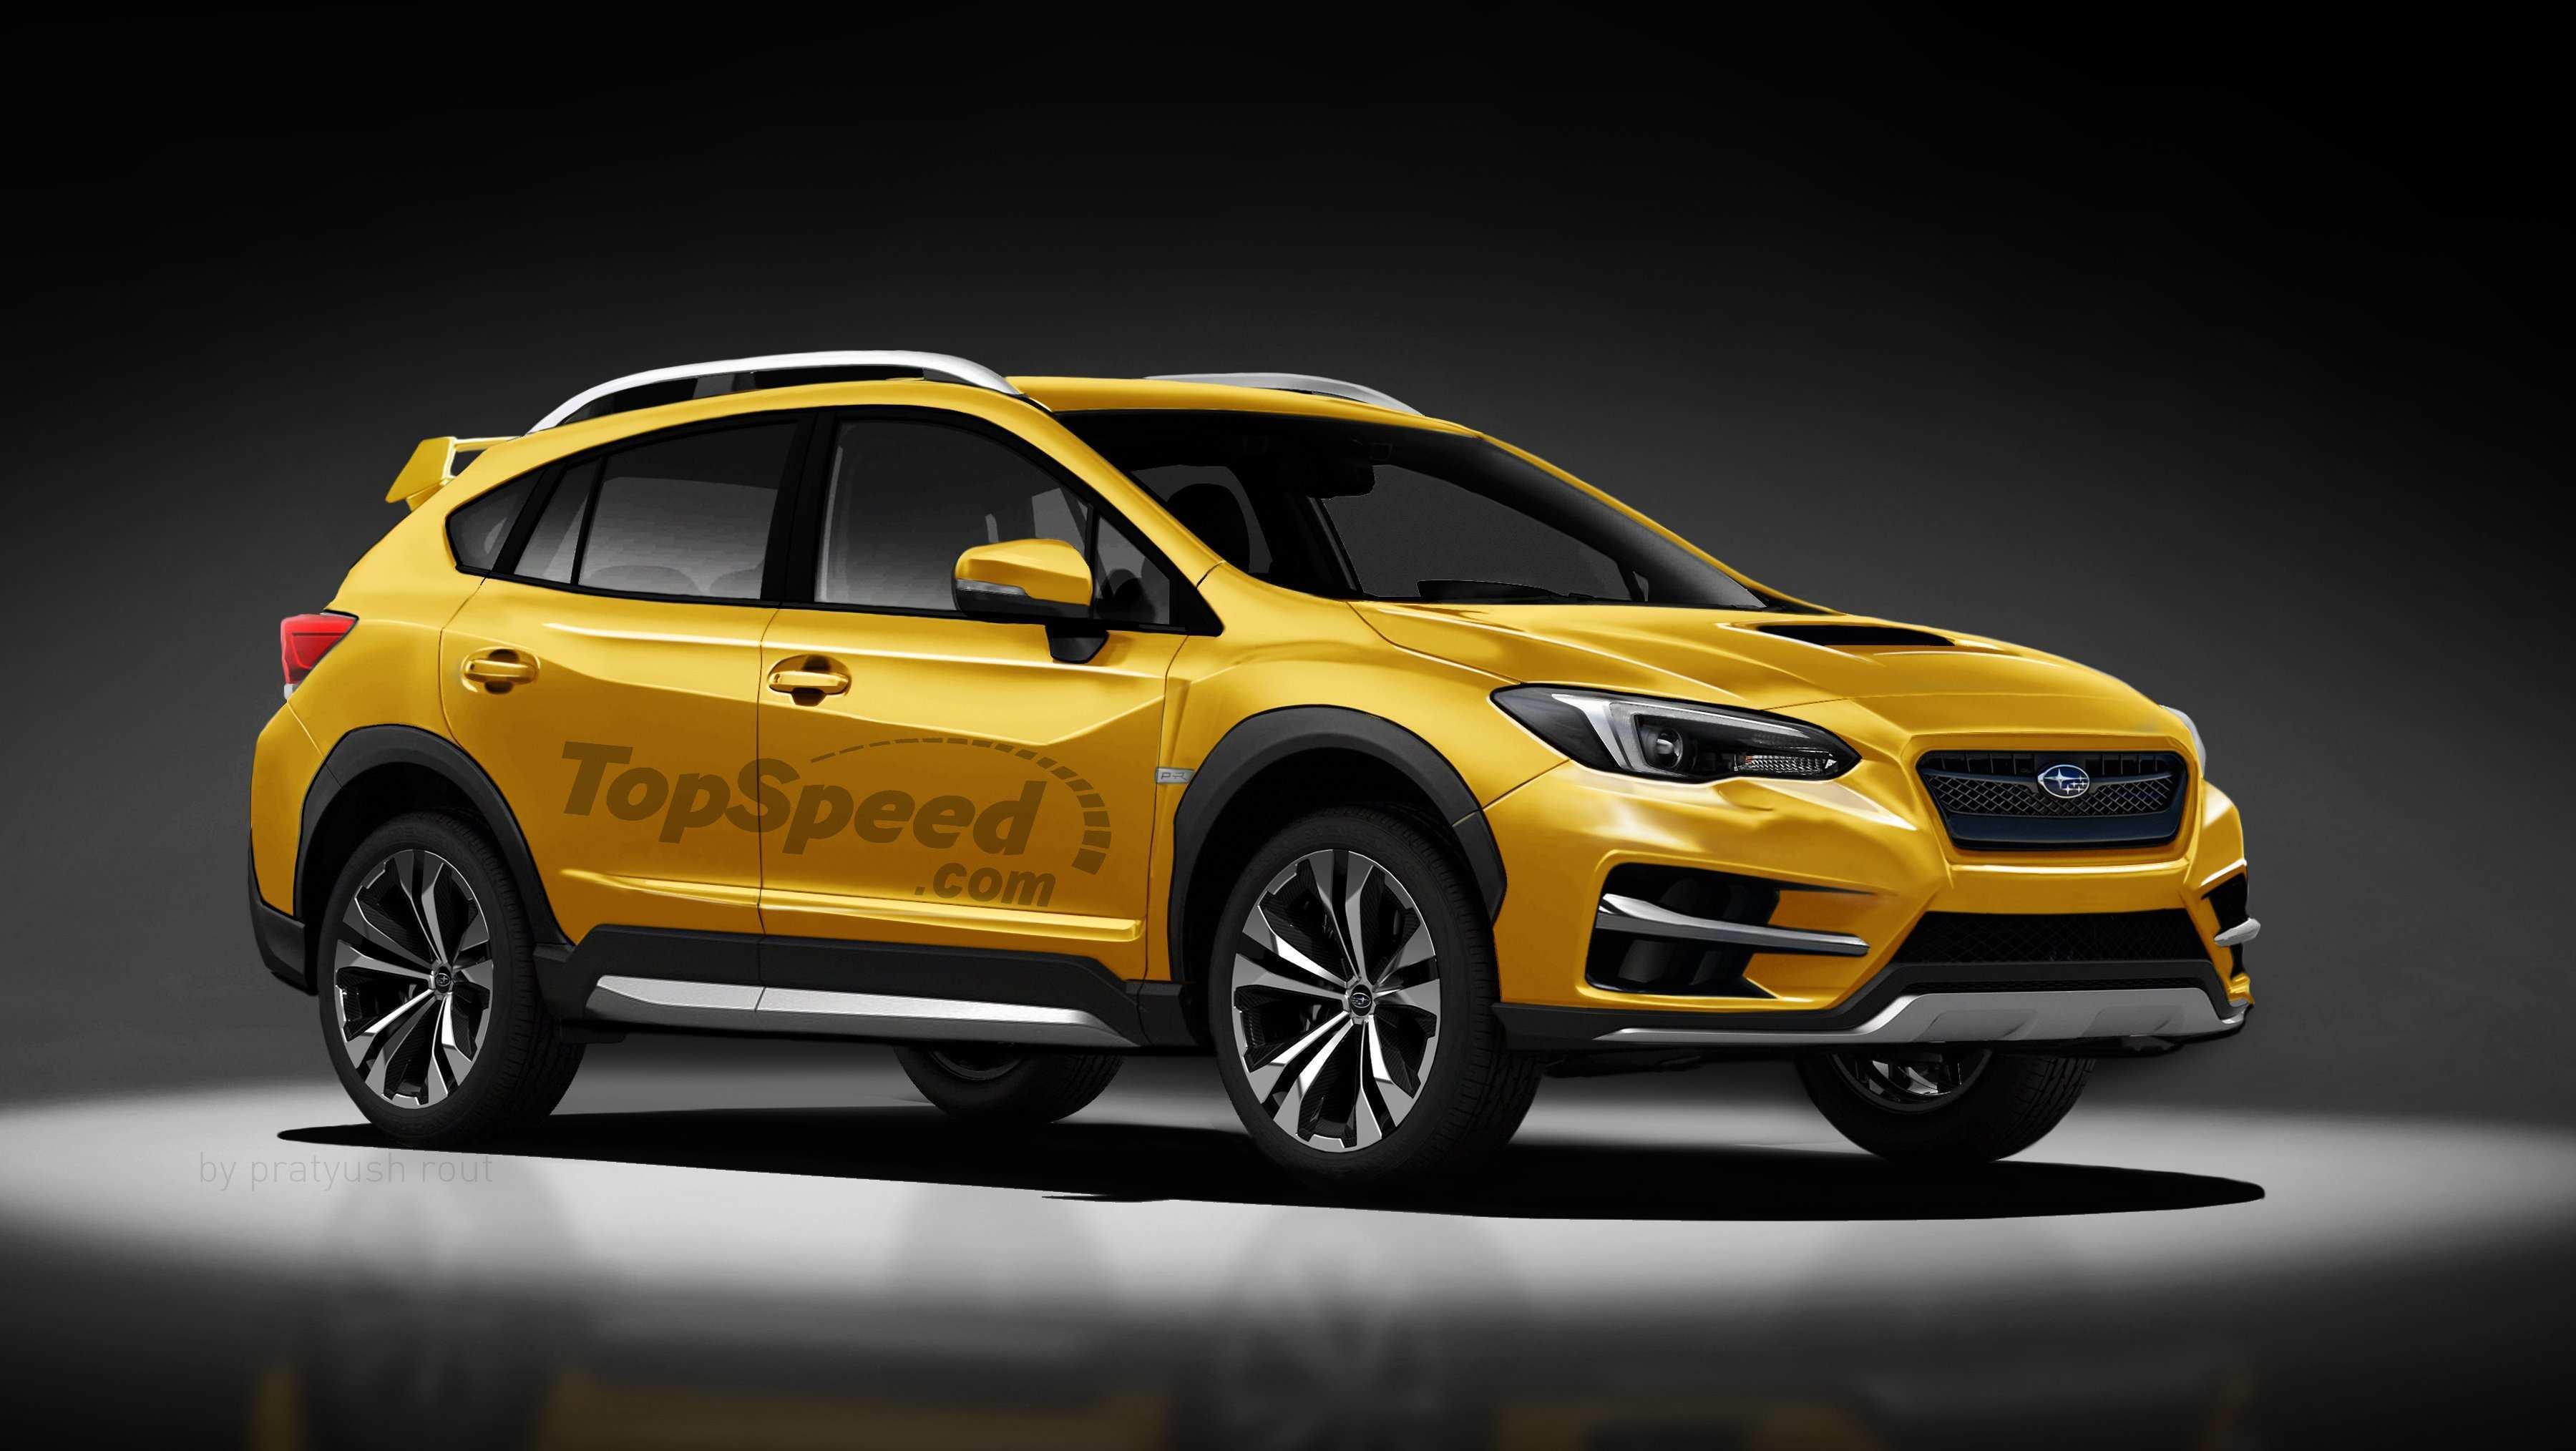 47 New 2020 Subaru Forester Length Concept with 2020 Subaru Forester Length